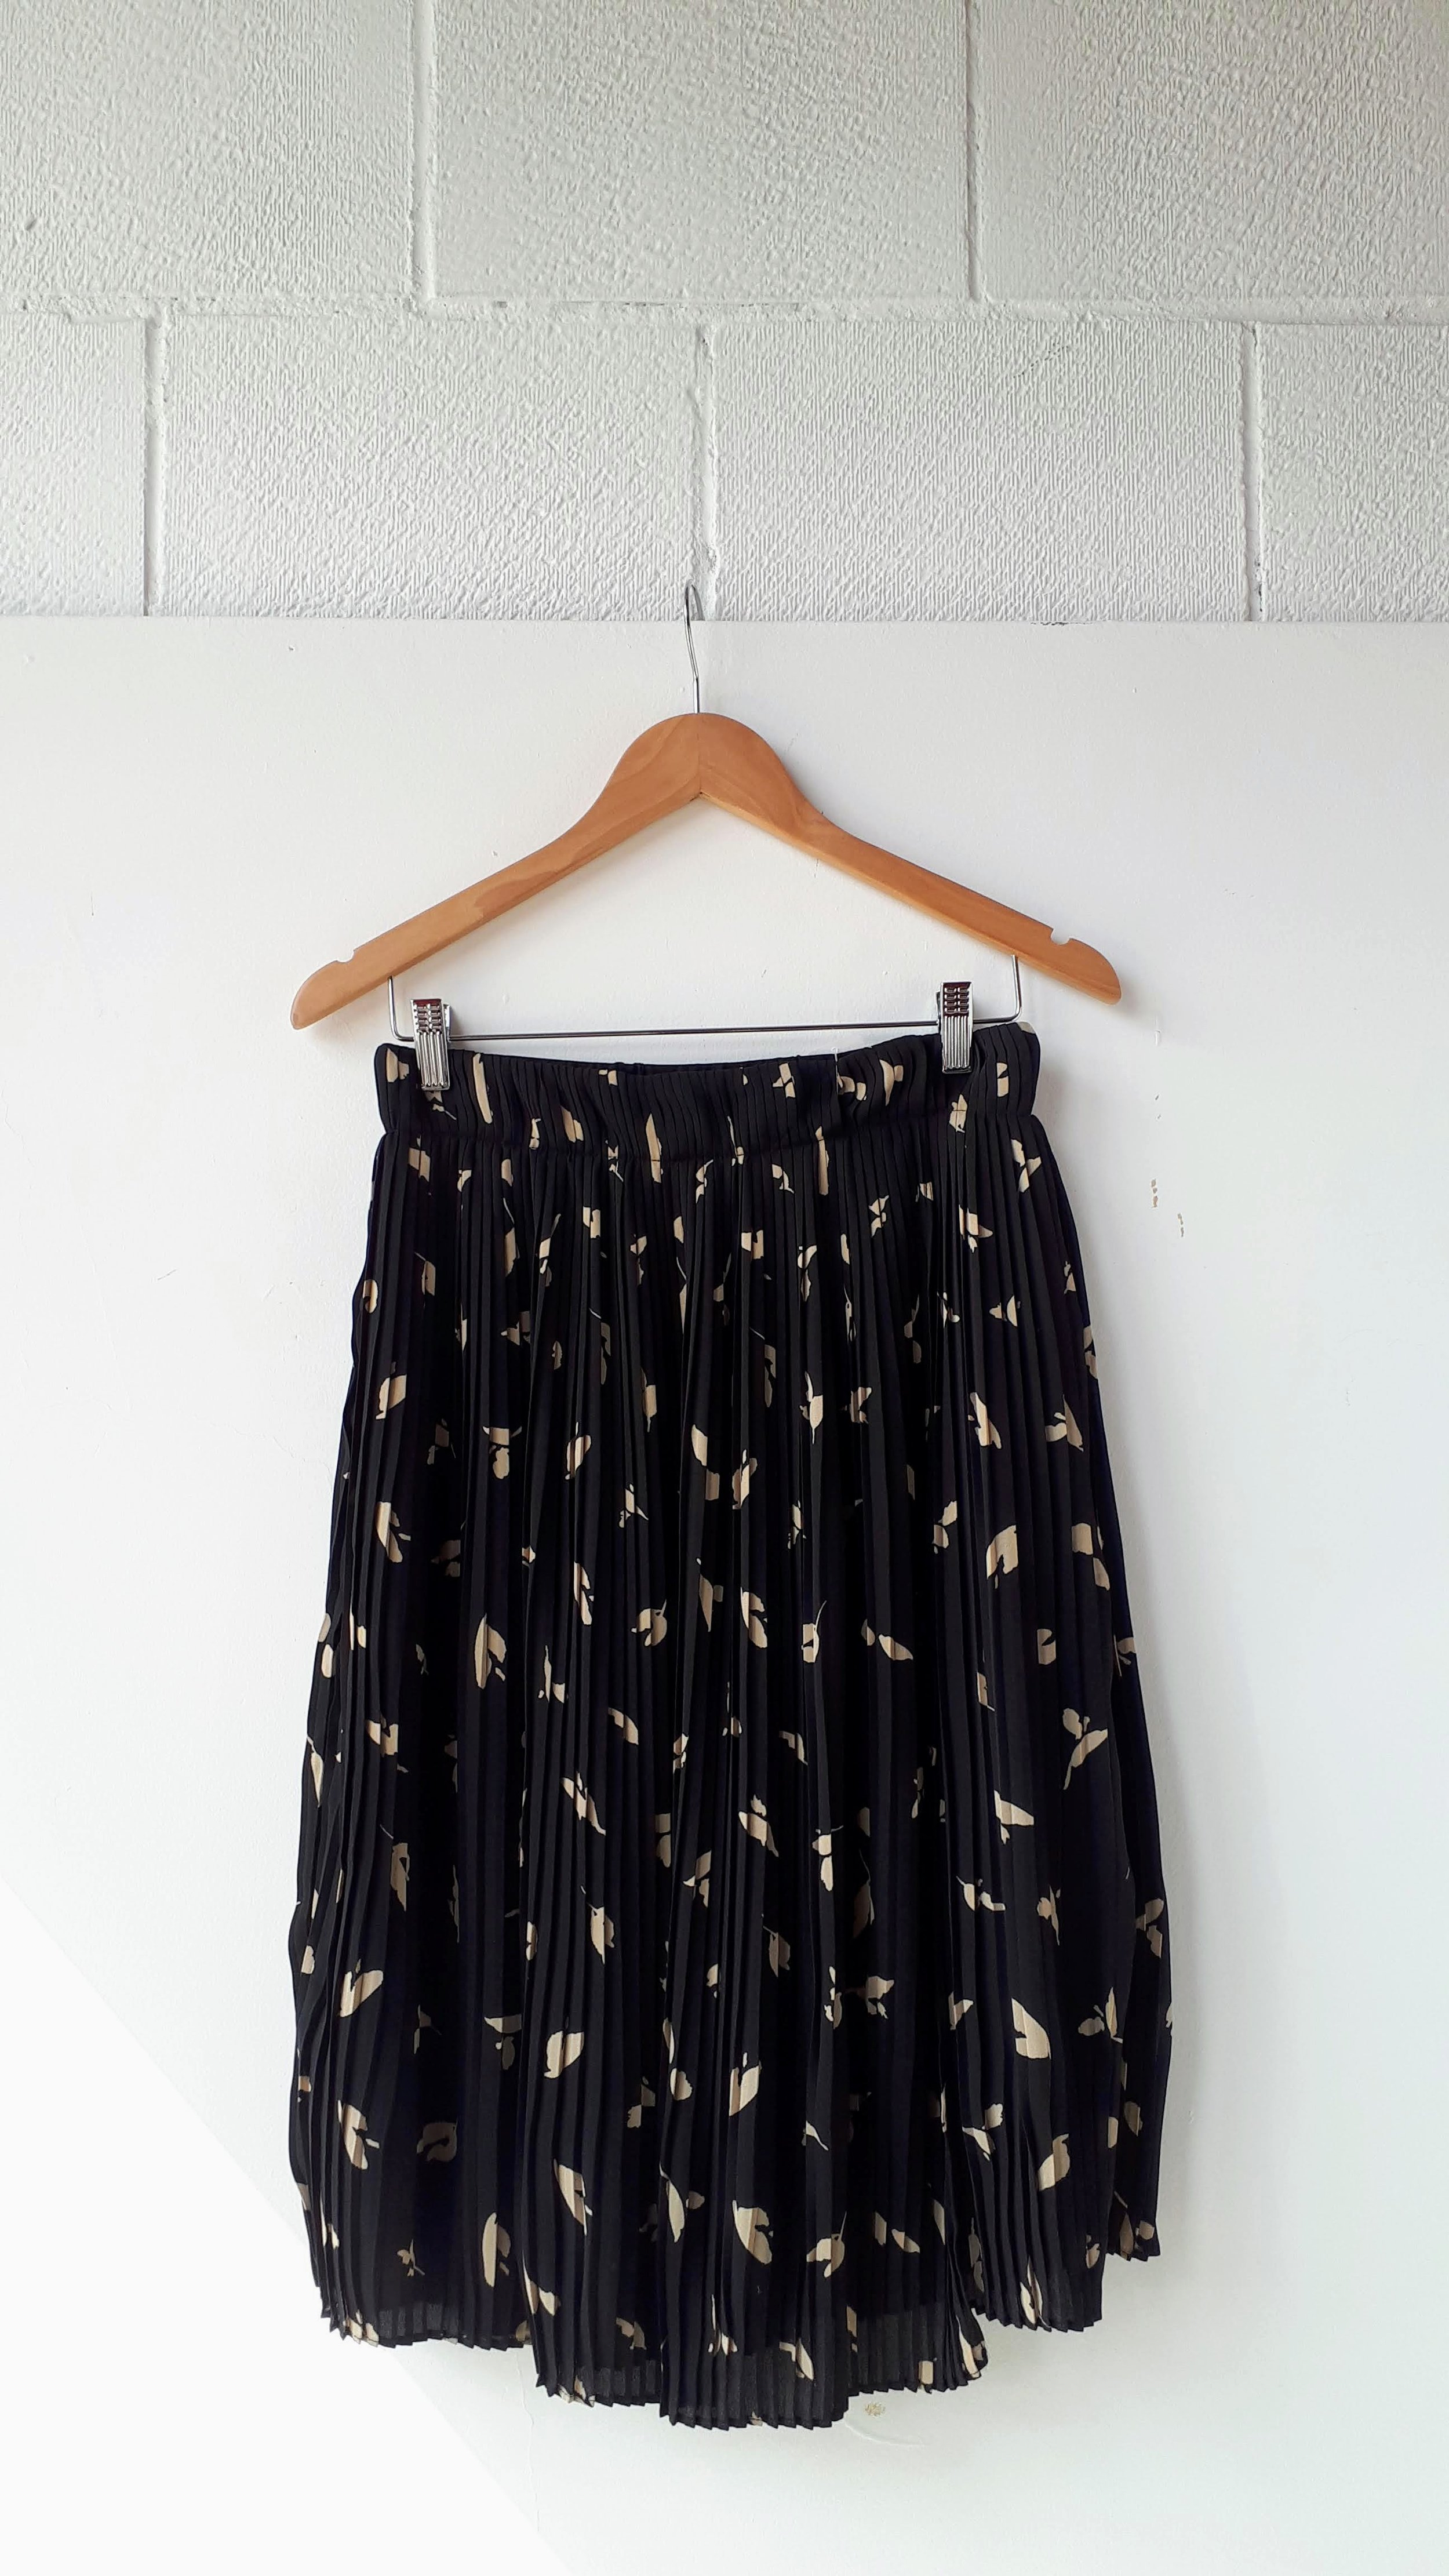 Oak + Fort skirt (NWT); Size M, $42